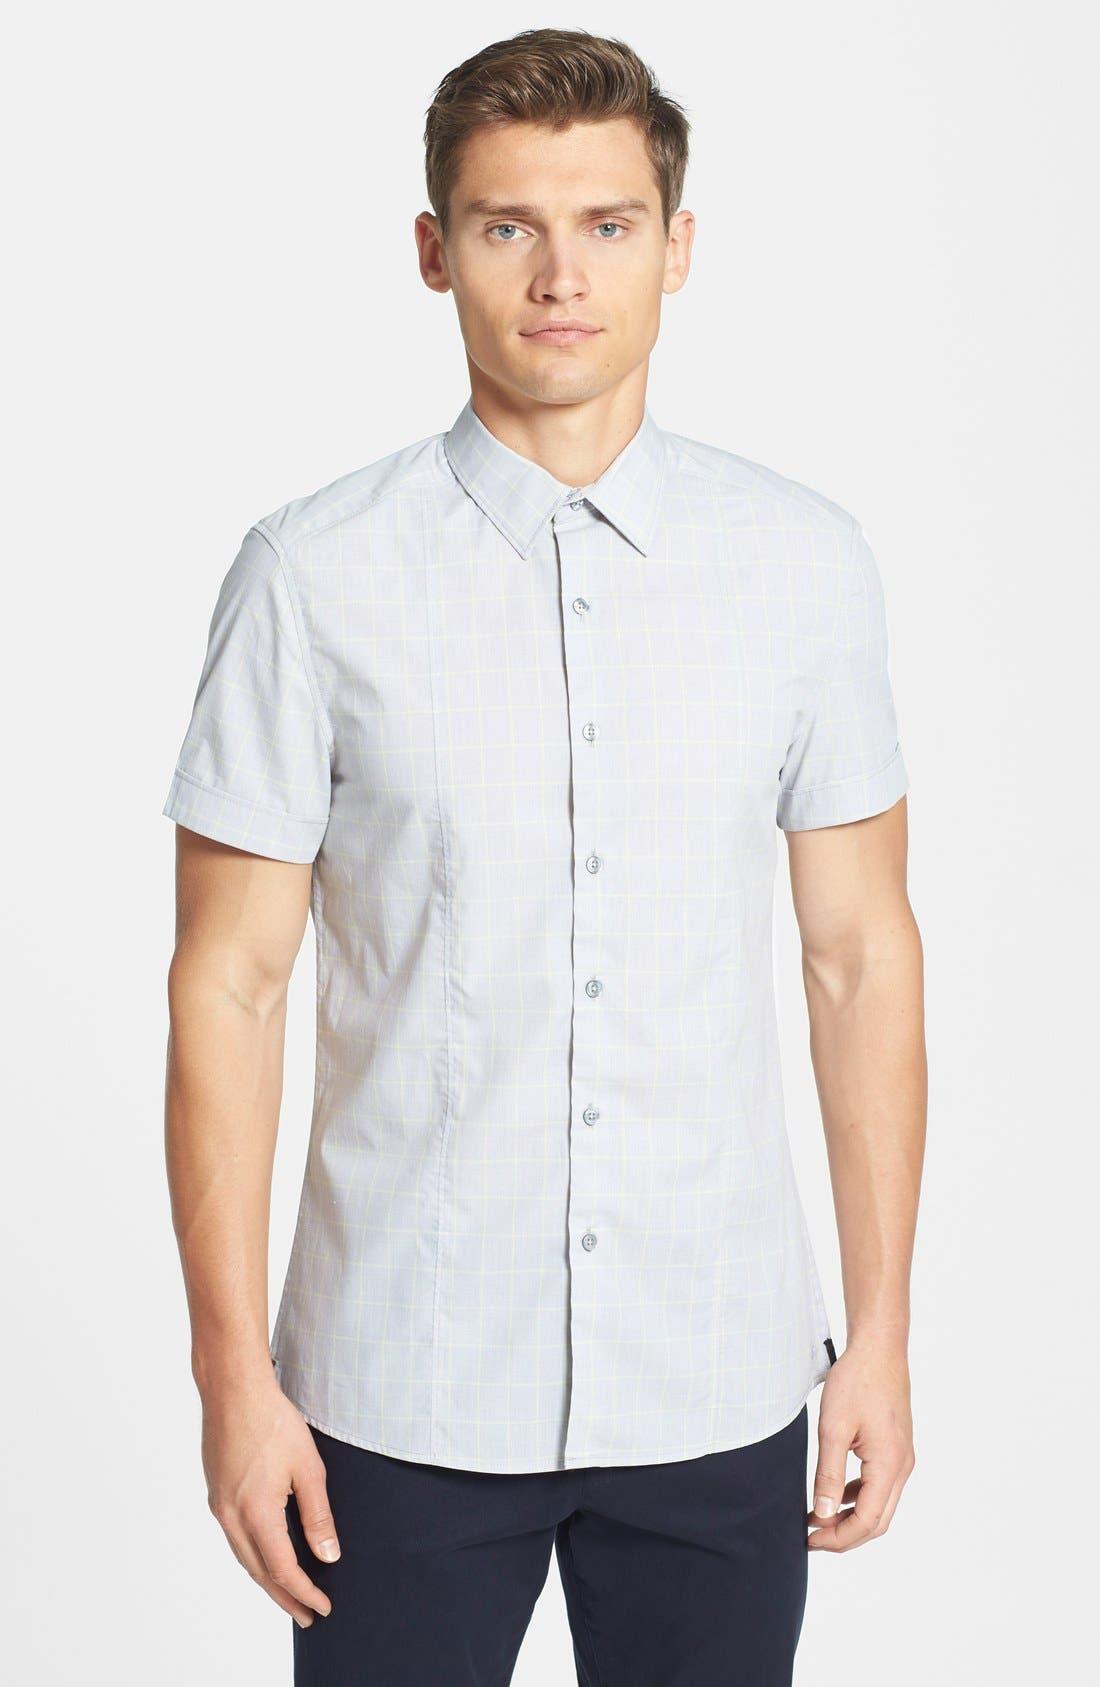 Alternate Image 1 Selected - Kenneth Cole New York Trim Fit Short Sleeve Windowpane Plaid Sport Shirt